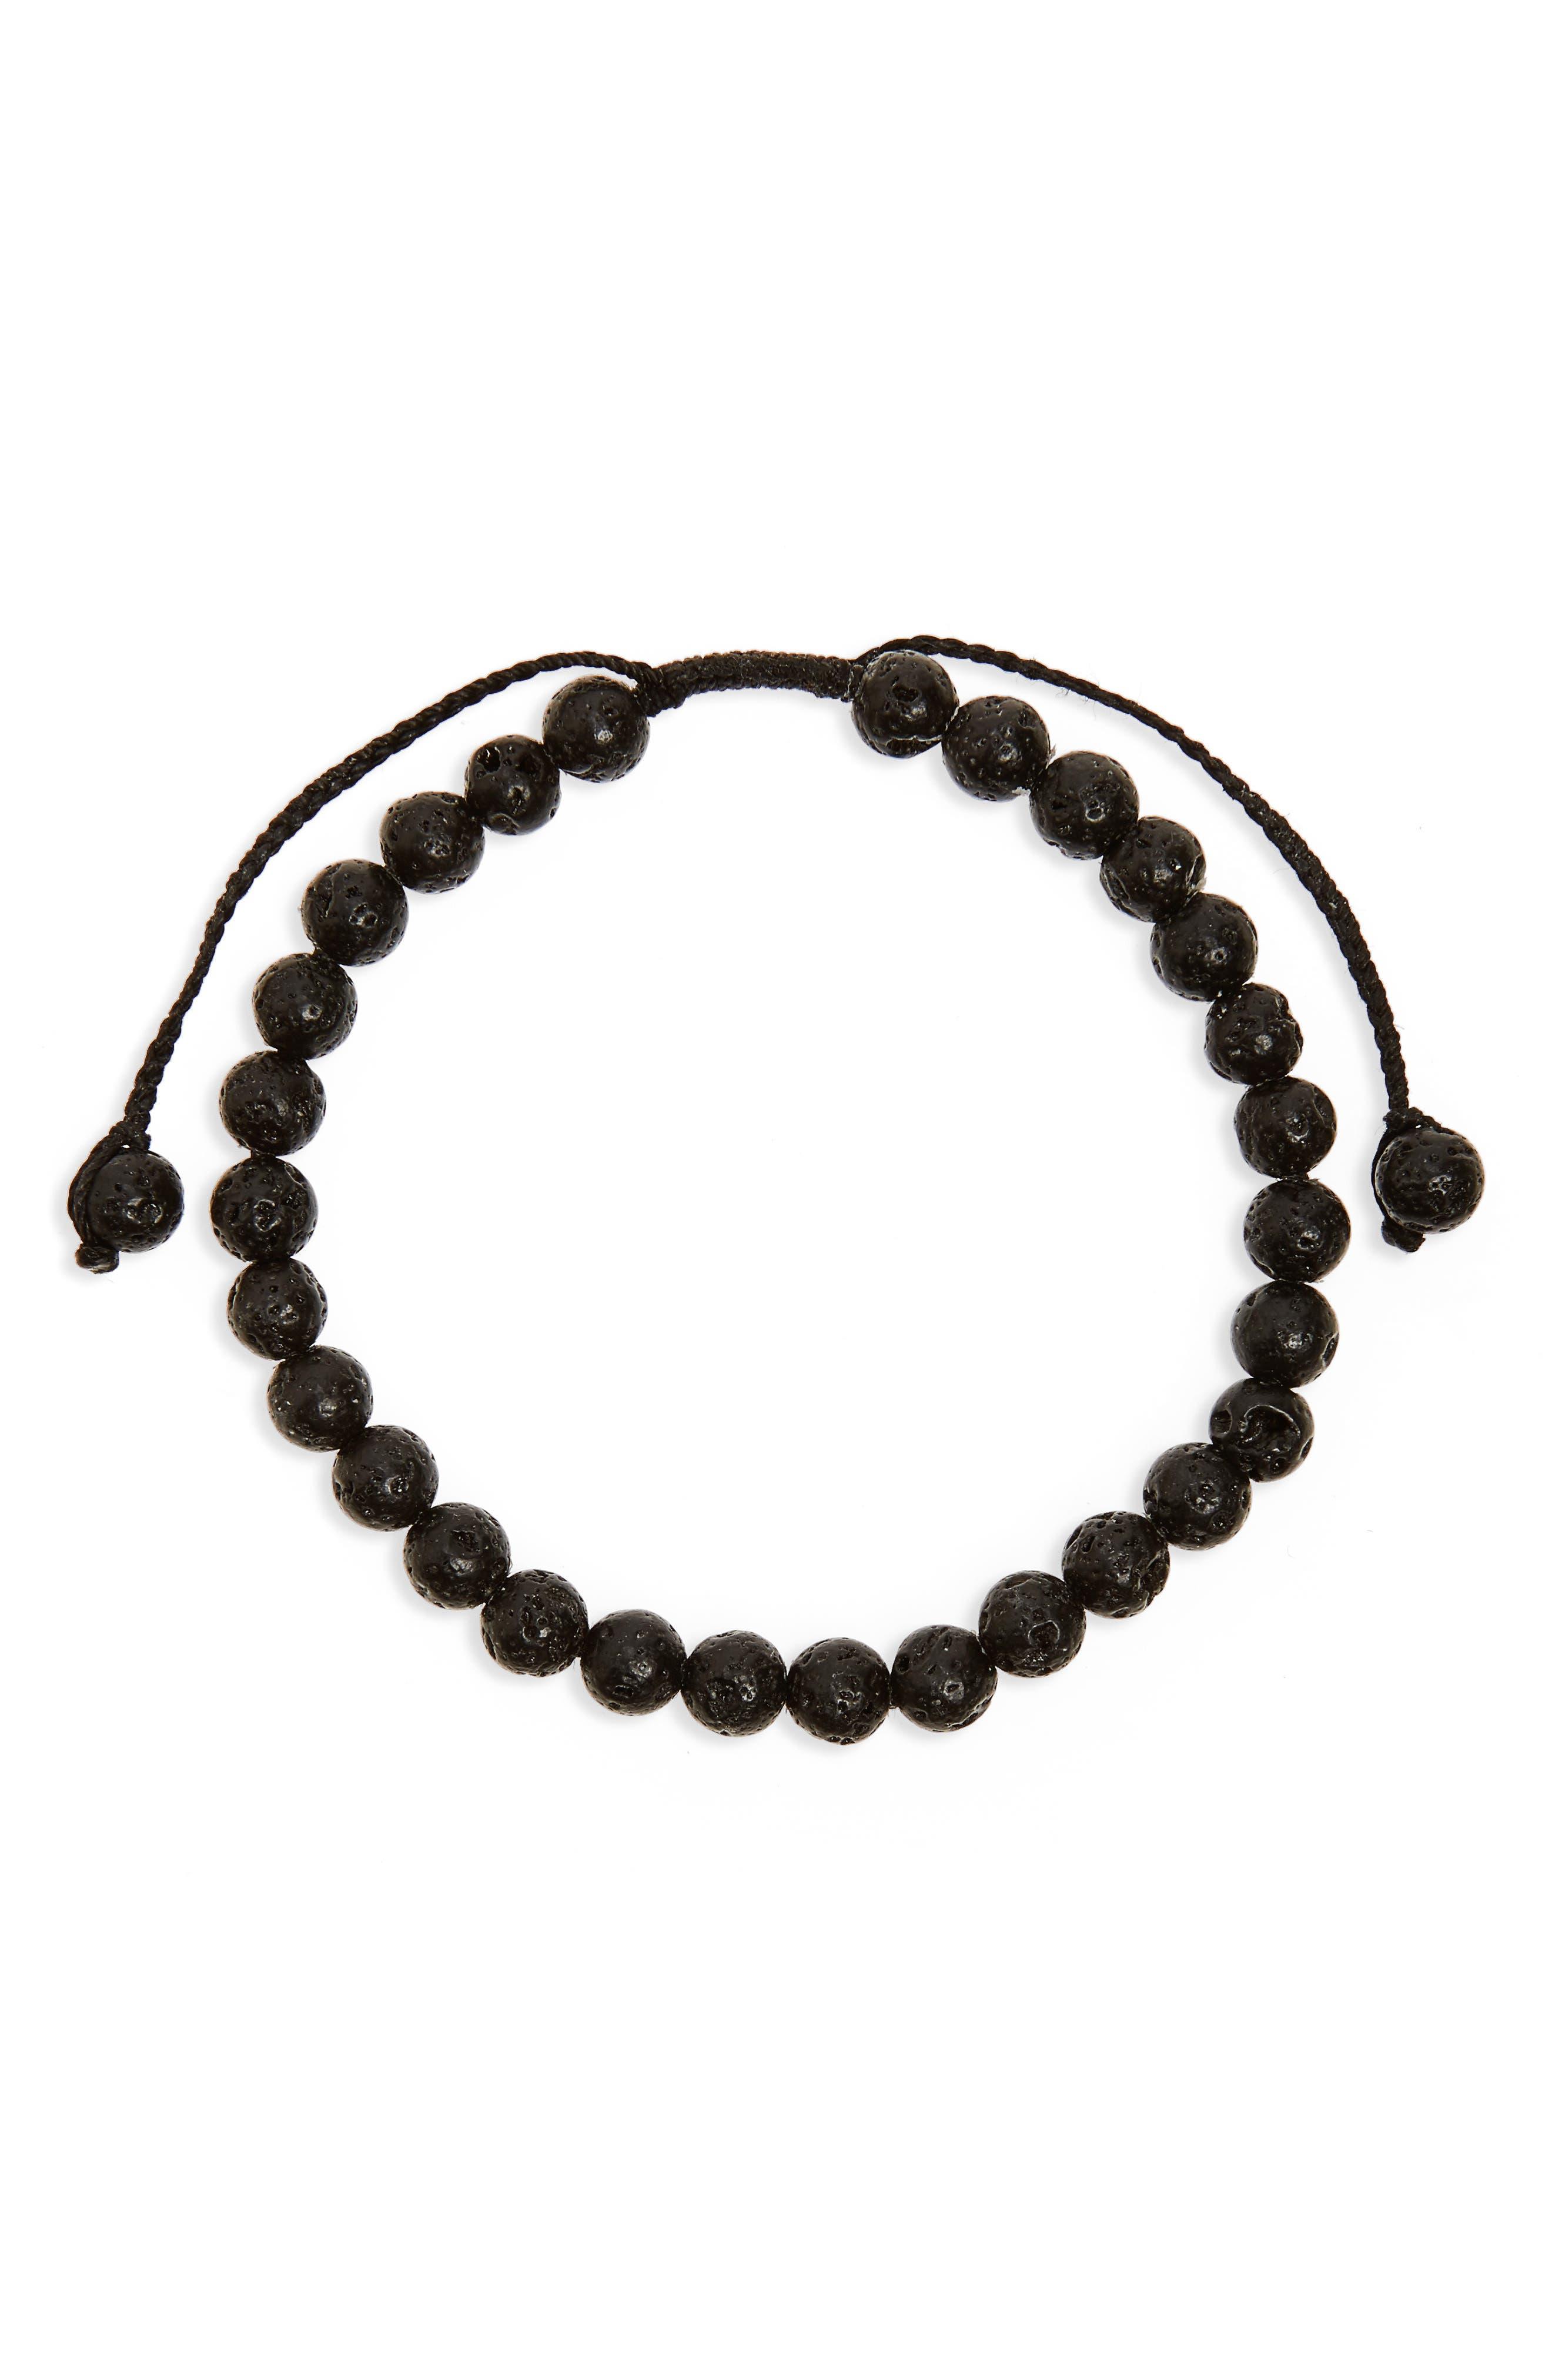 Main Image - Link Up Lava Stone Bead Bracelet